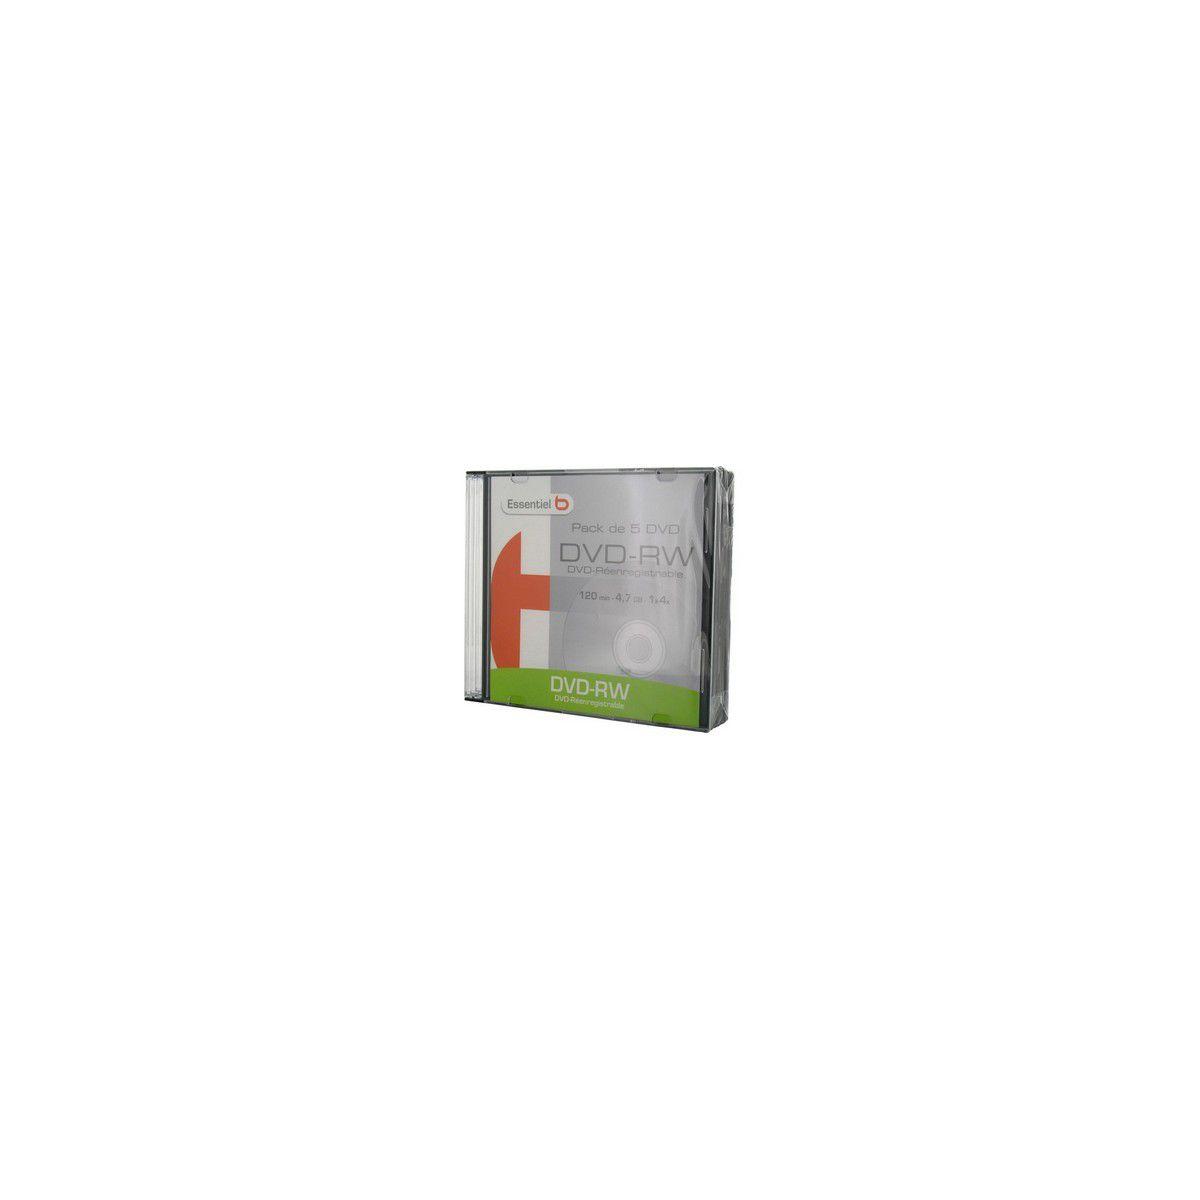 Dvd sc p5 dvd-rw 16x slim - produit coup de coeur webdistrib.com !